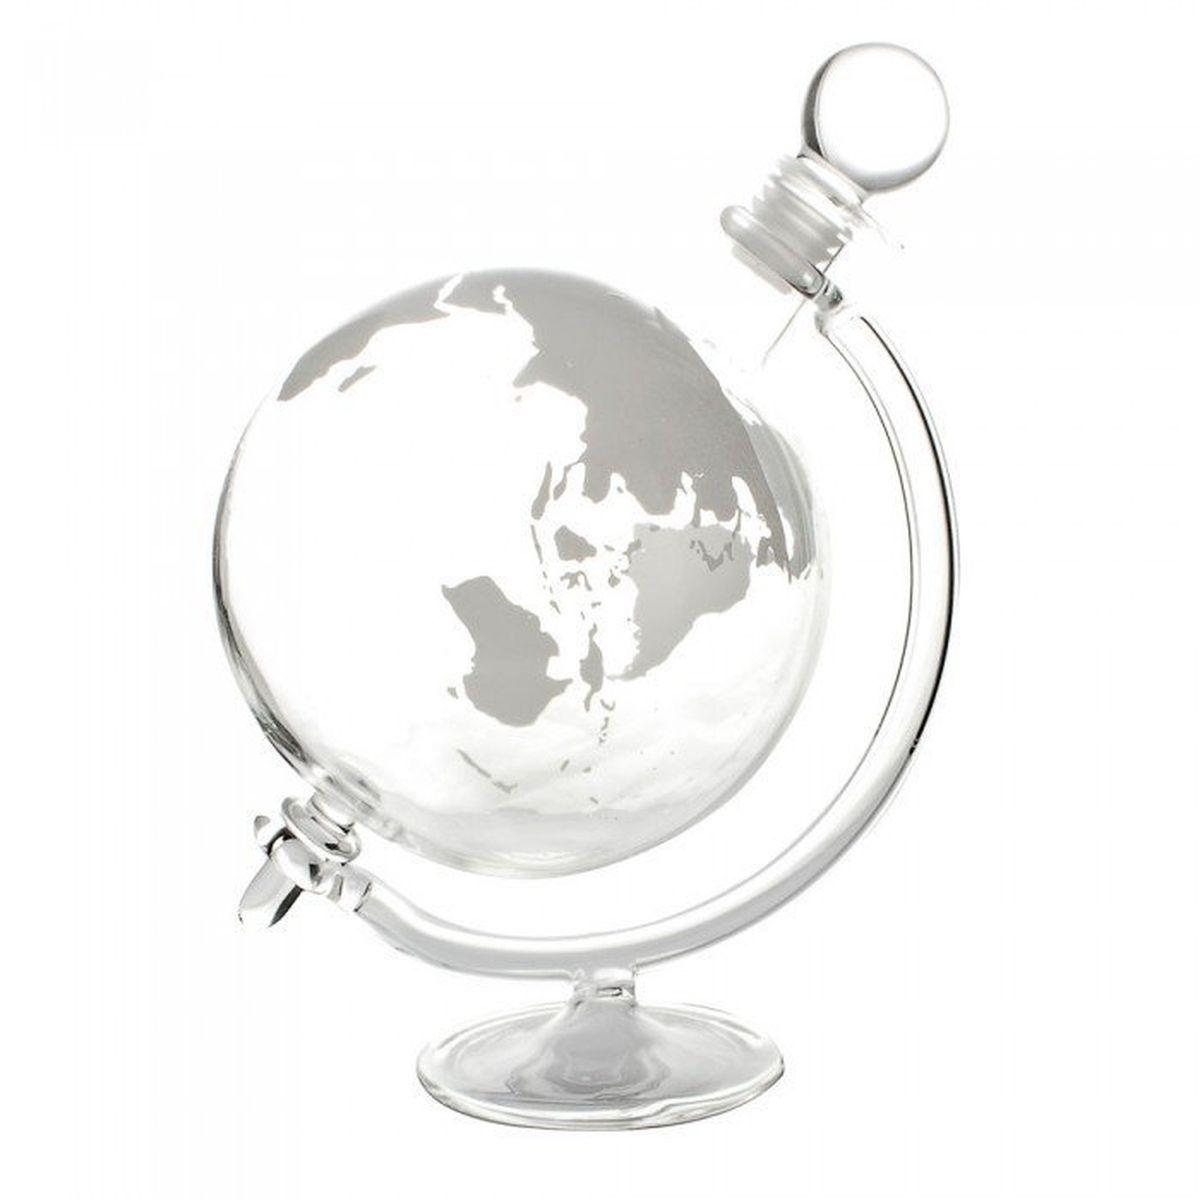 Globe Decanter with Cradle